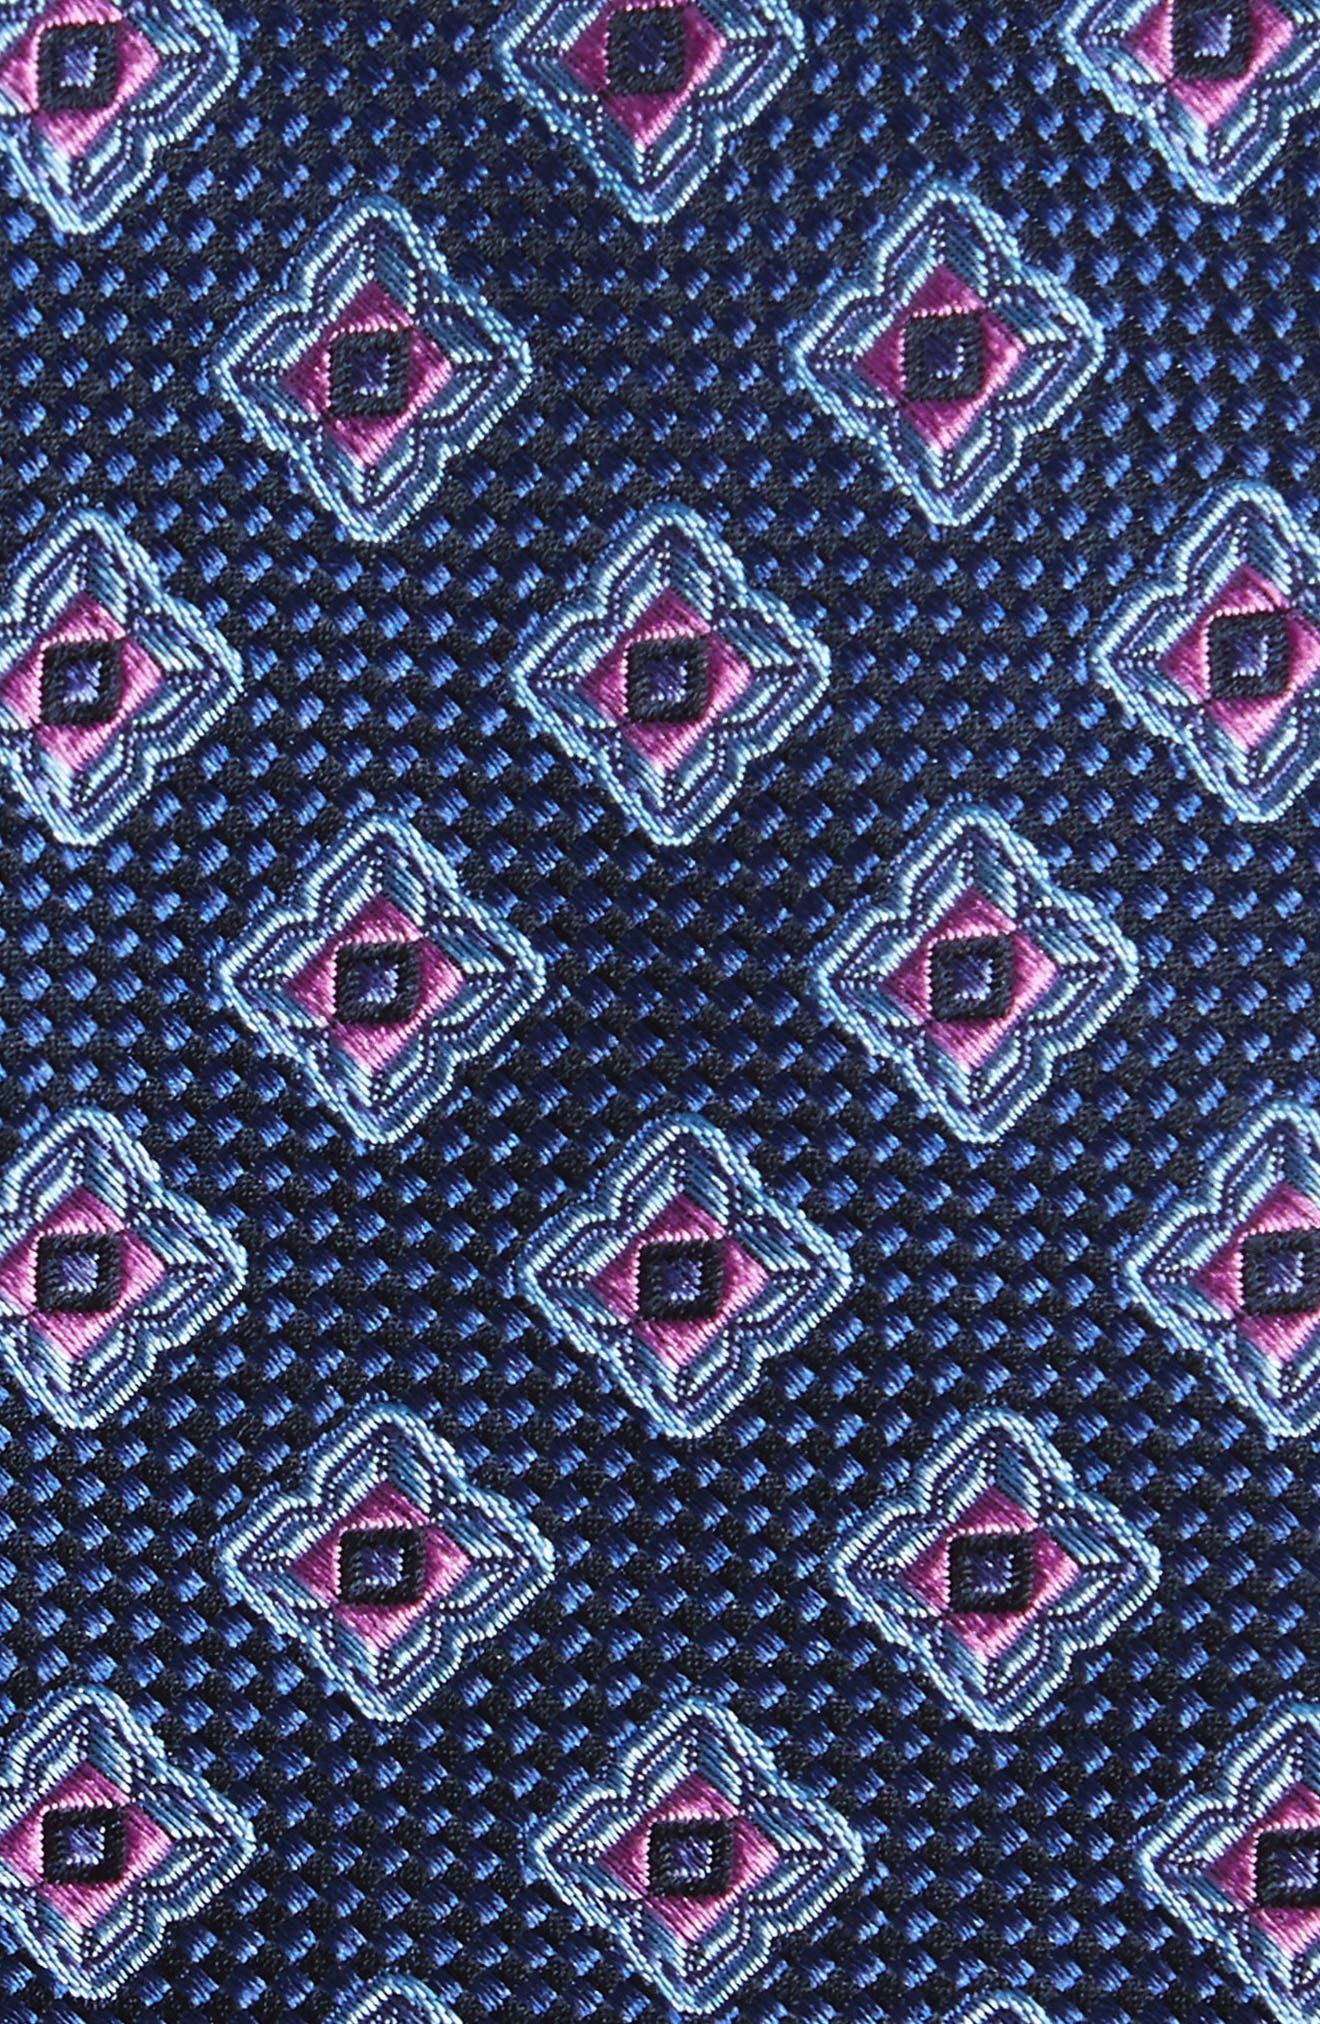 Ethan Medallion Silk Tie,                             Alternate thumbnail 2, color,                             411